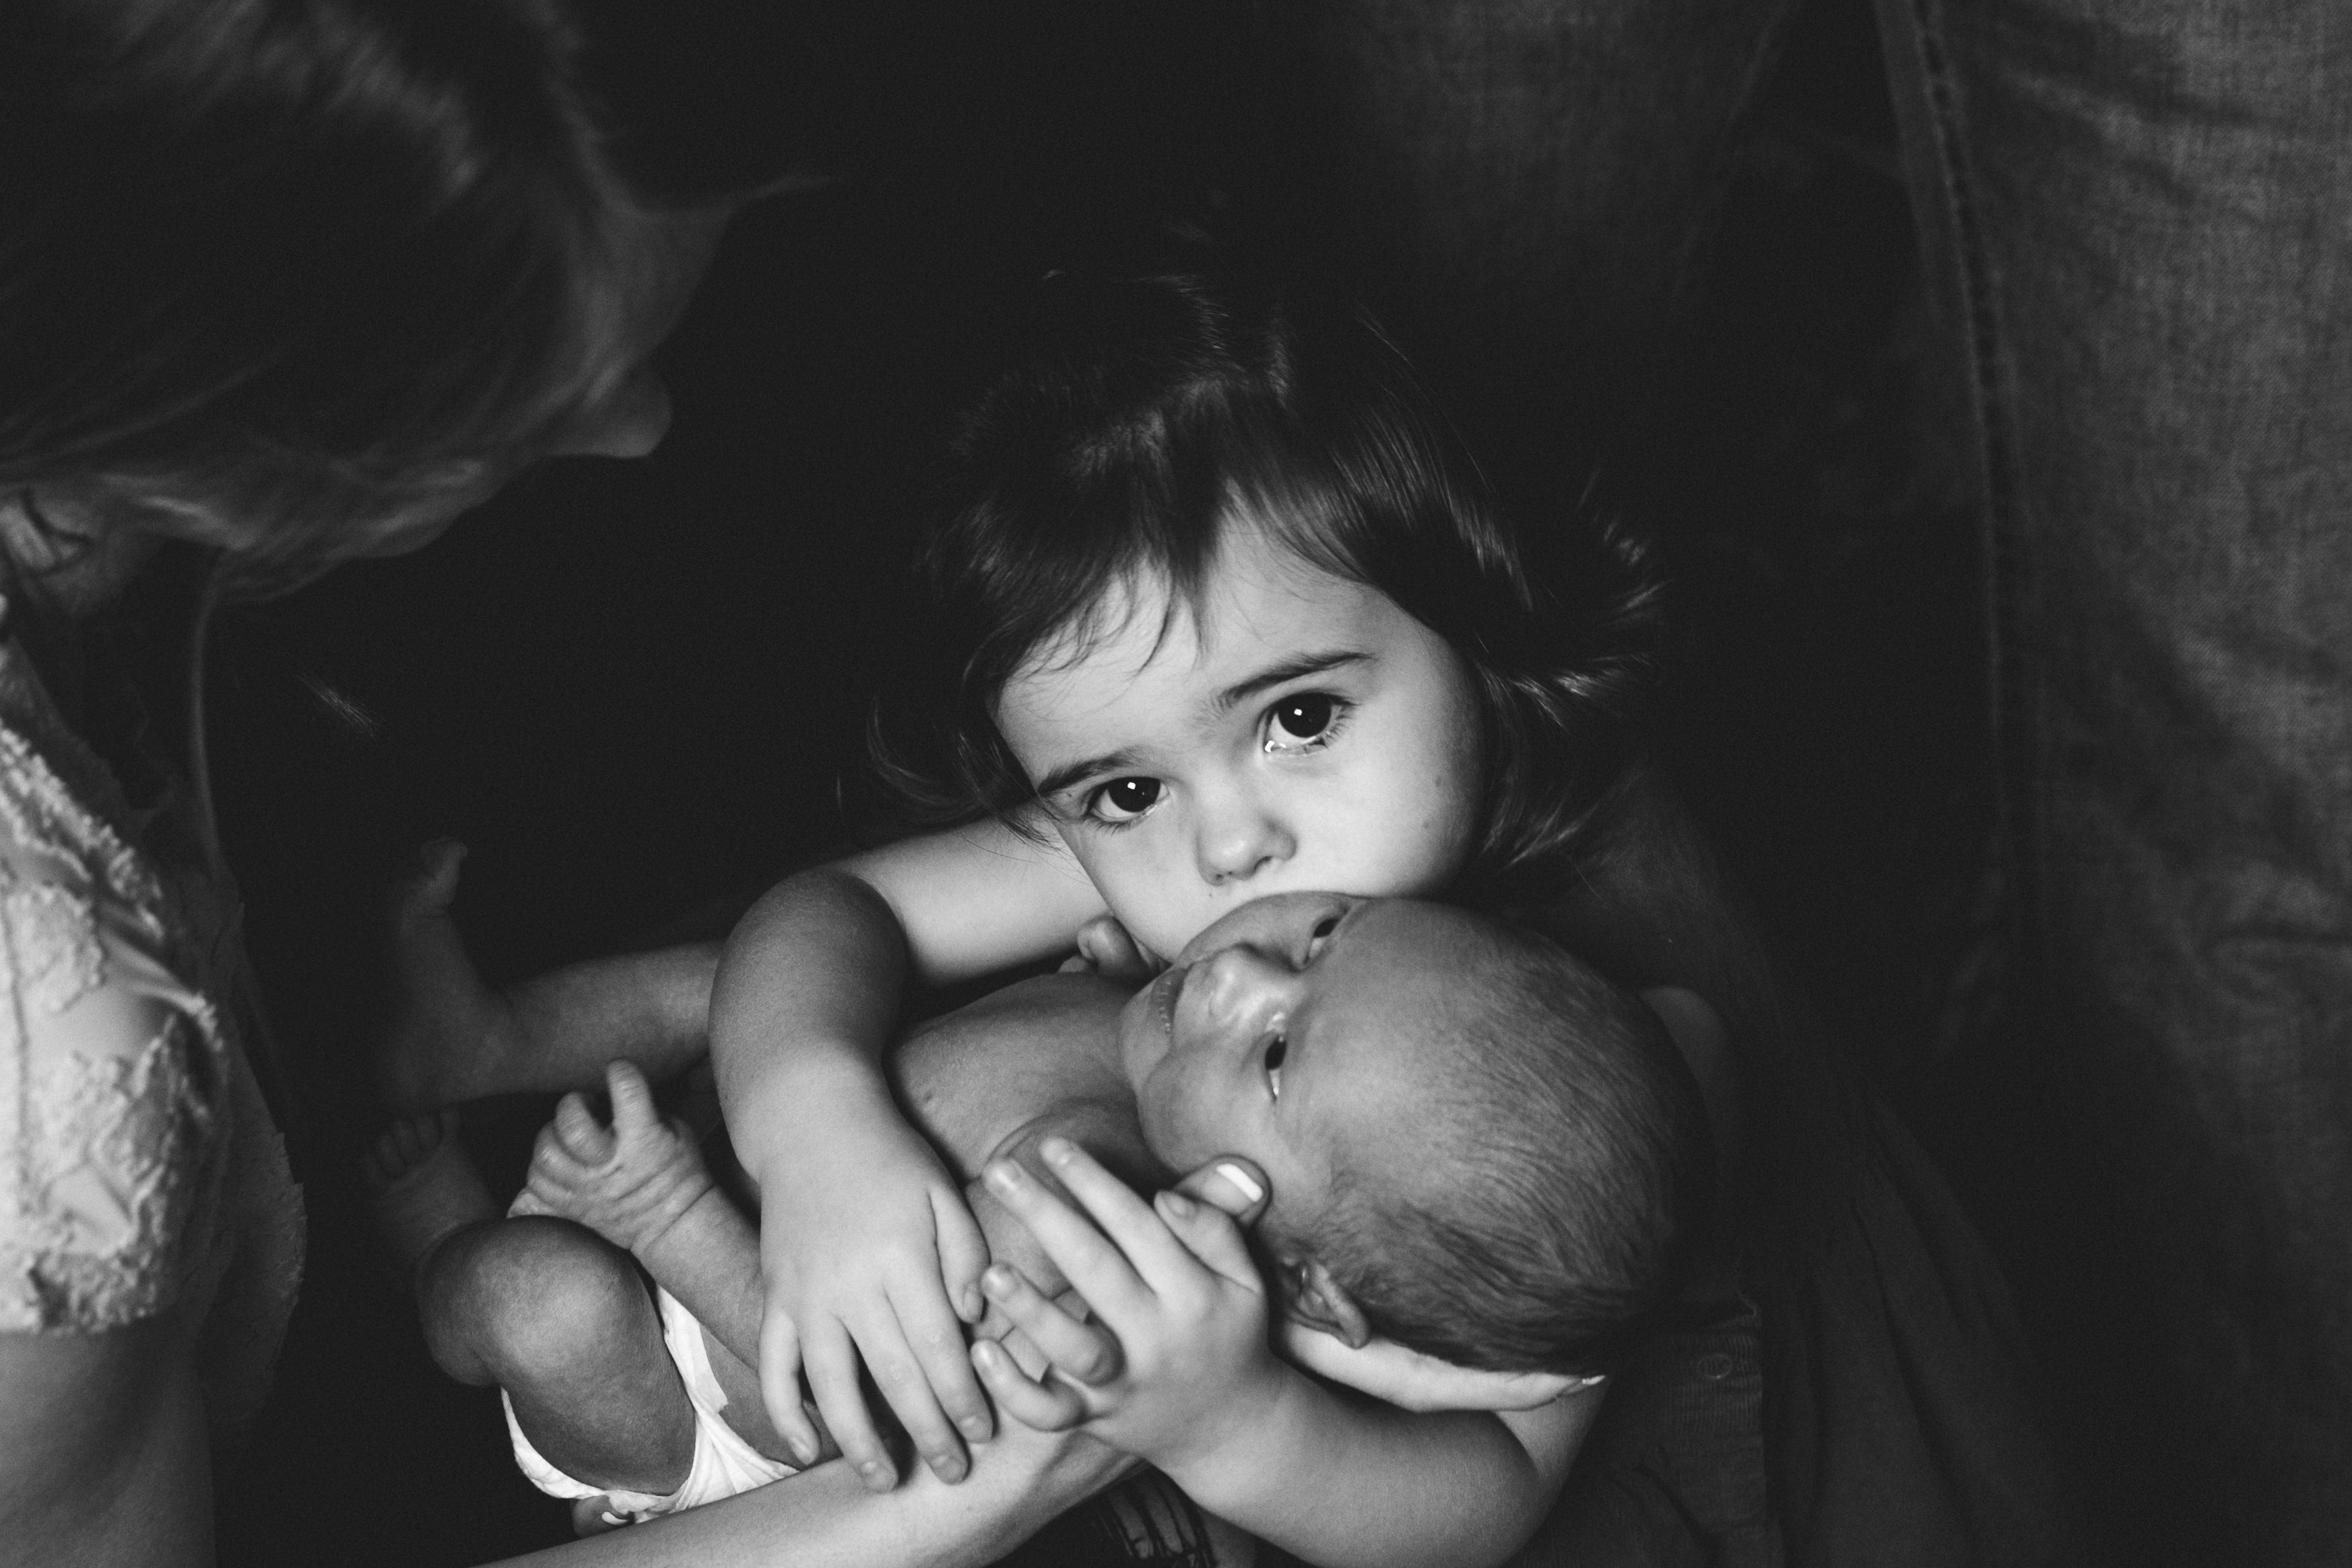 Ryland_newborn_TariGunstonephotography-11 copy